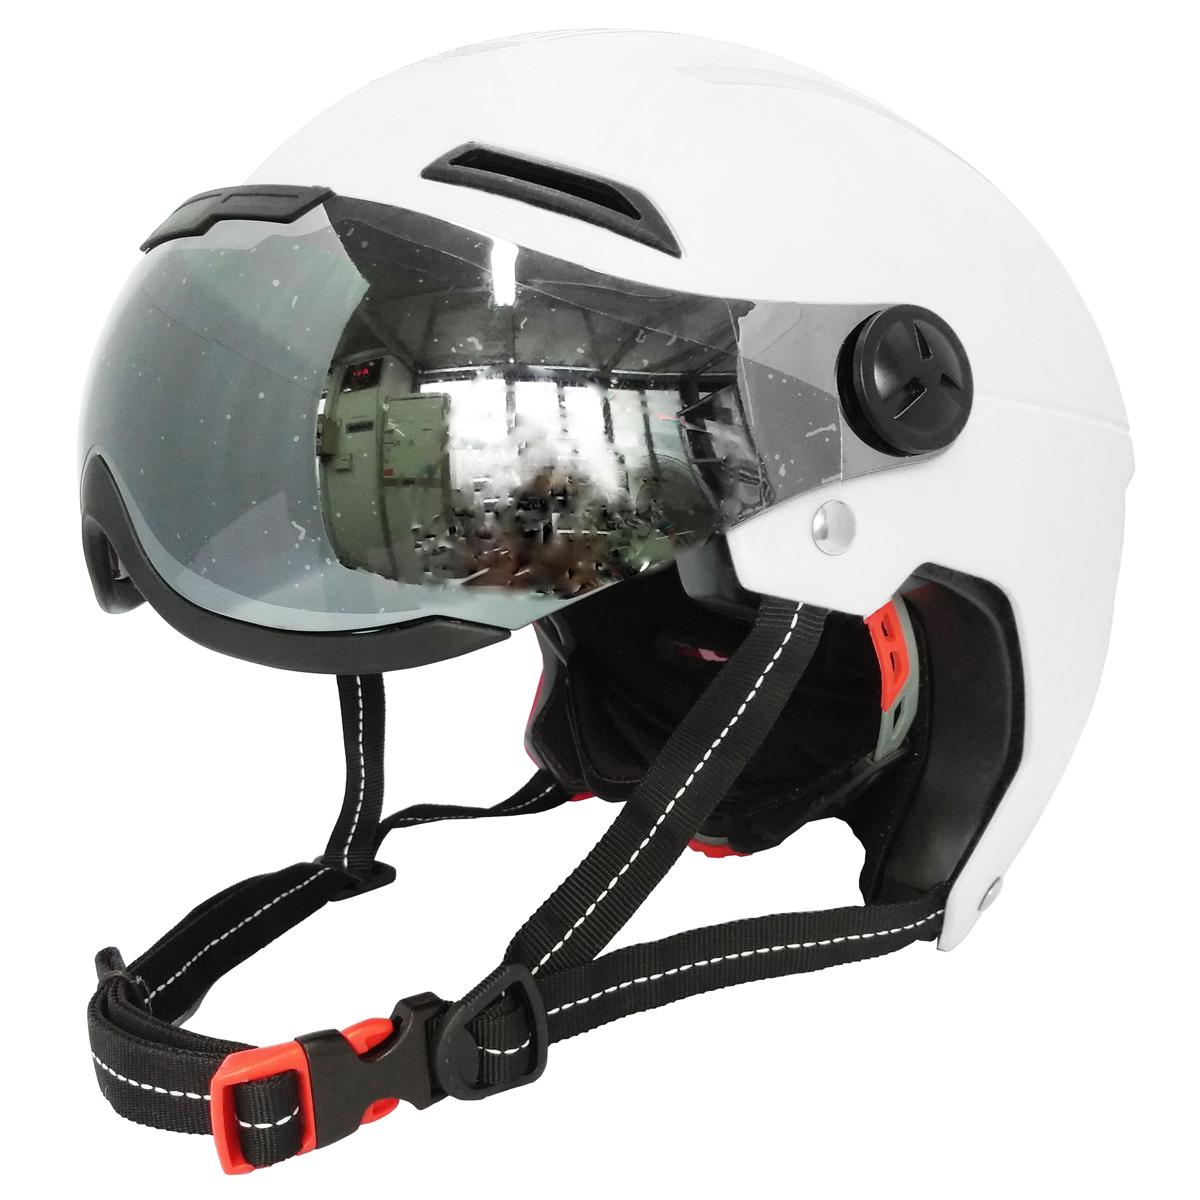 E1-12G E-Bike Helmet